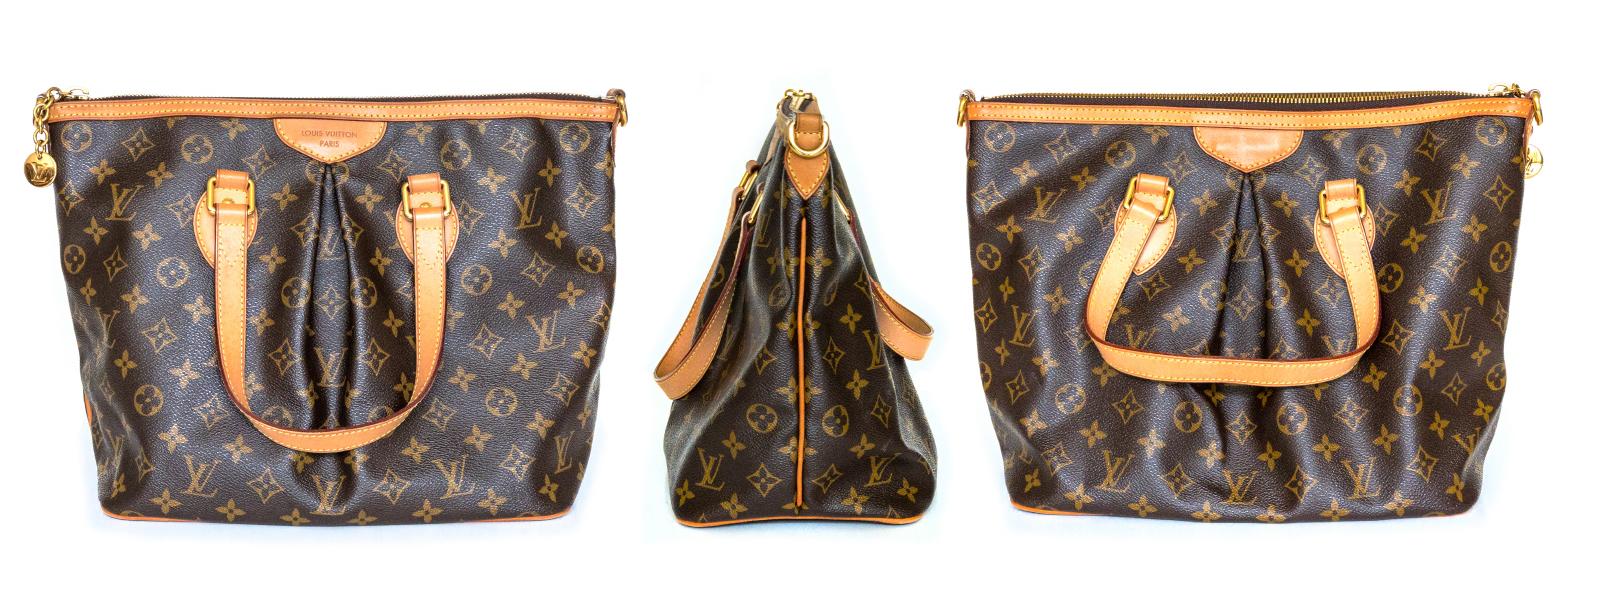 【LV皮包】 Palermo MM 托特包与 Jamais 限量秀款水彩印肩背包改成 NANO NOÉ 迷你水桶包